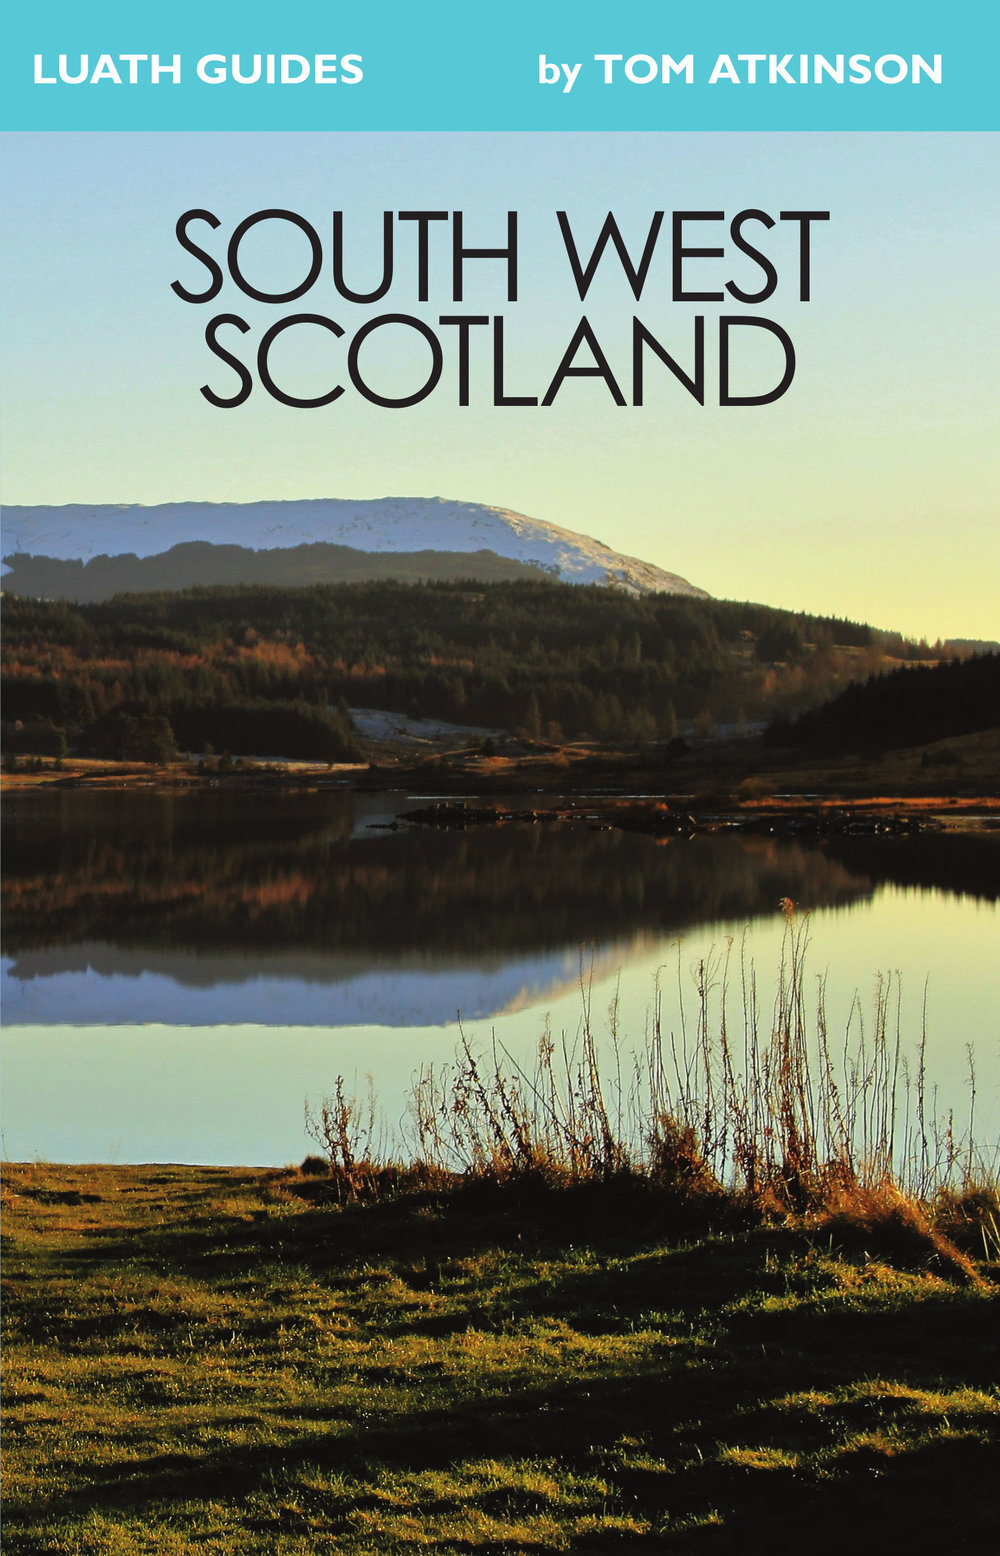 South+West+Scotland+Tom+Atkinson+9781913025205+Luath+Press.jpg